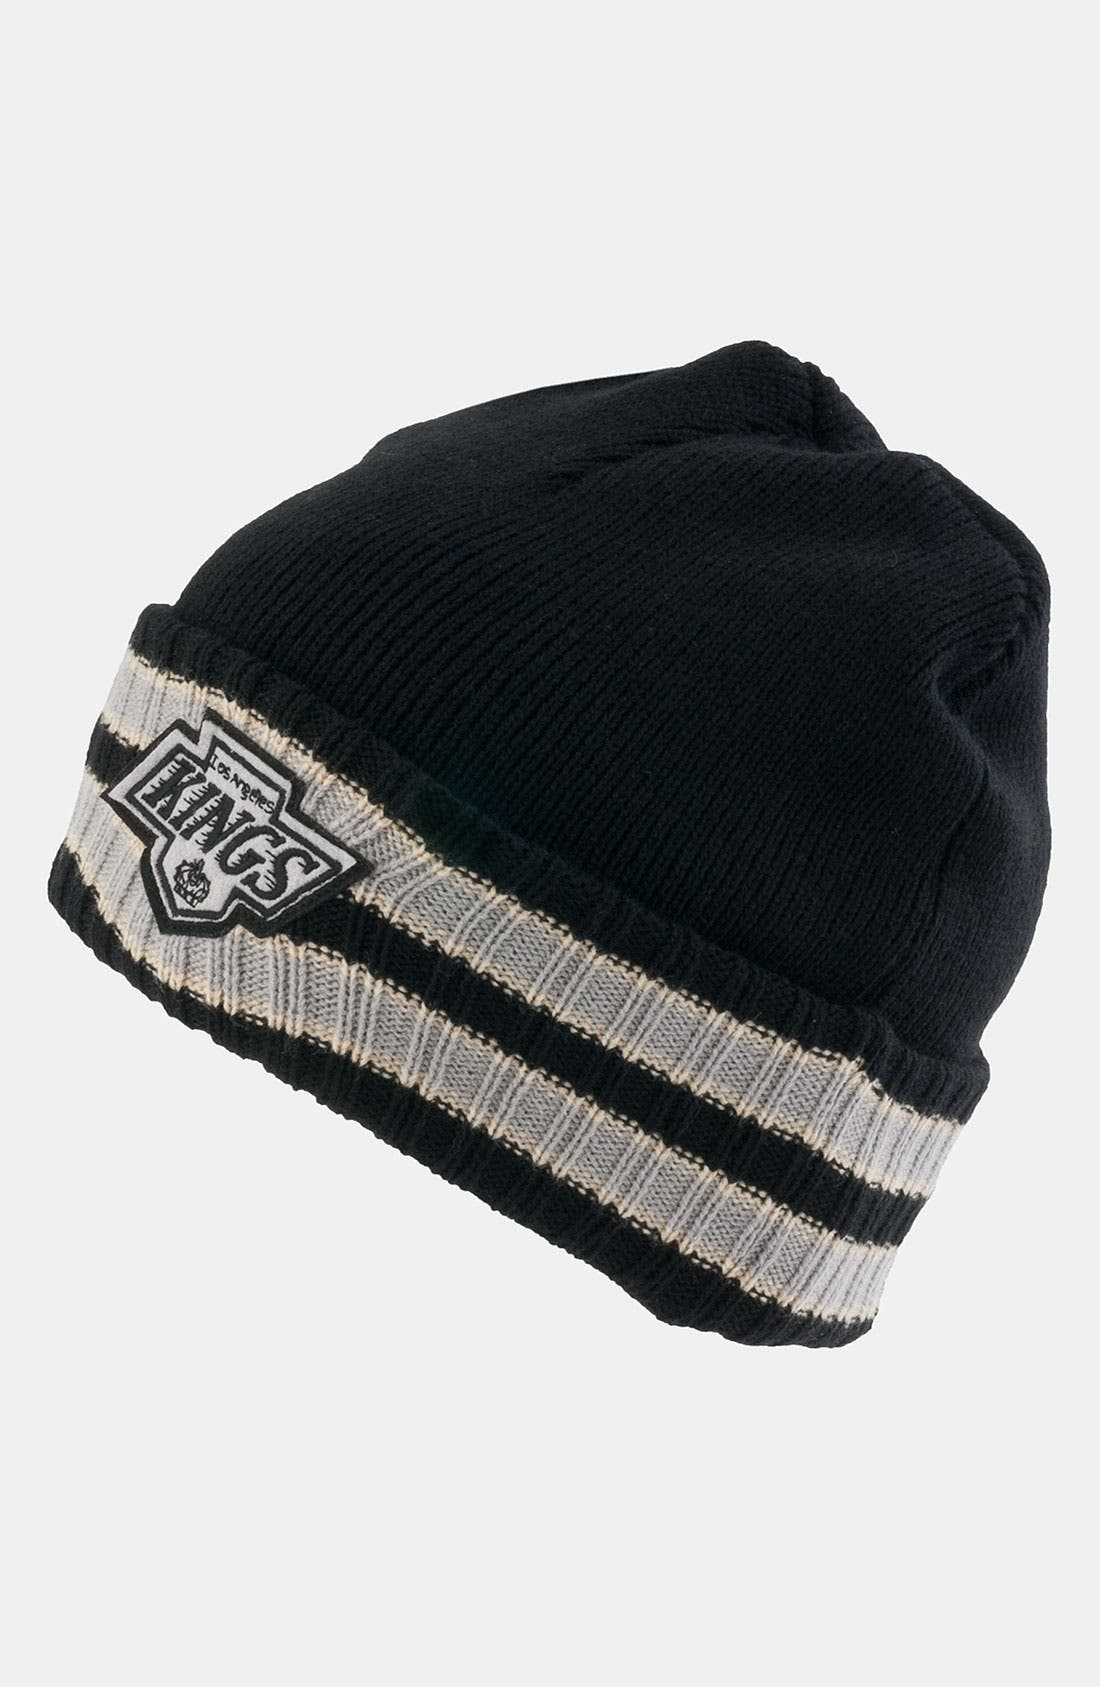 Main Image - American Needle 'Los Angeles Kings - Slash' Knit Hat